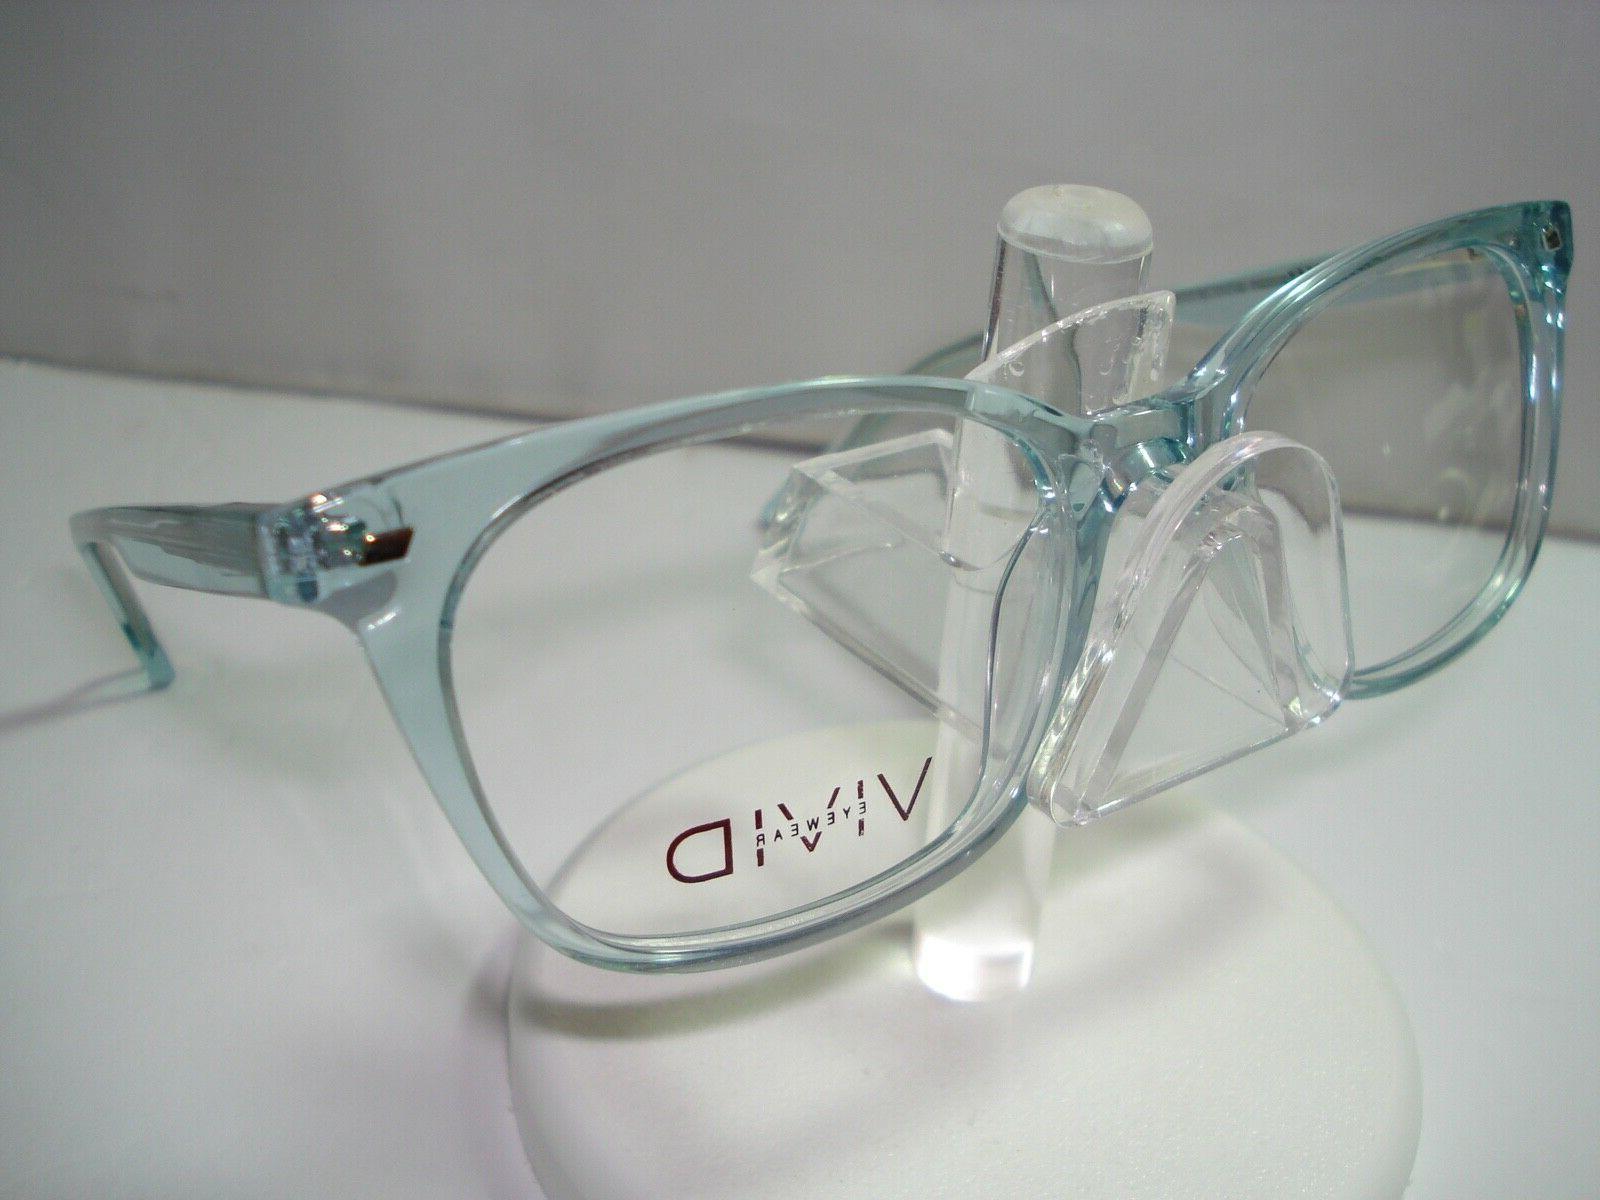 new vivid ladies eyeglasses 912 blue